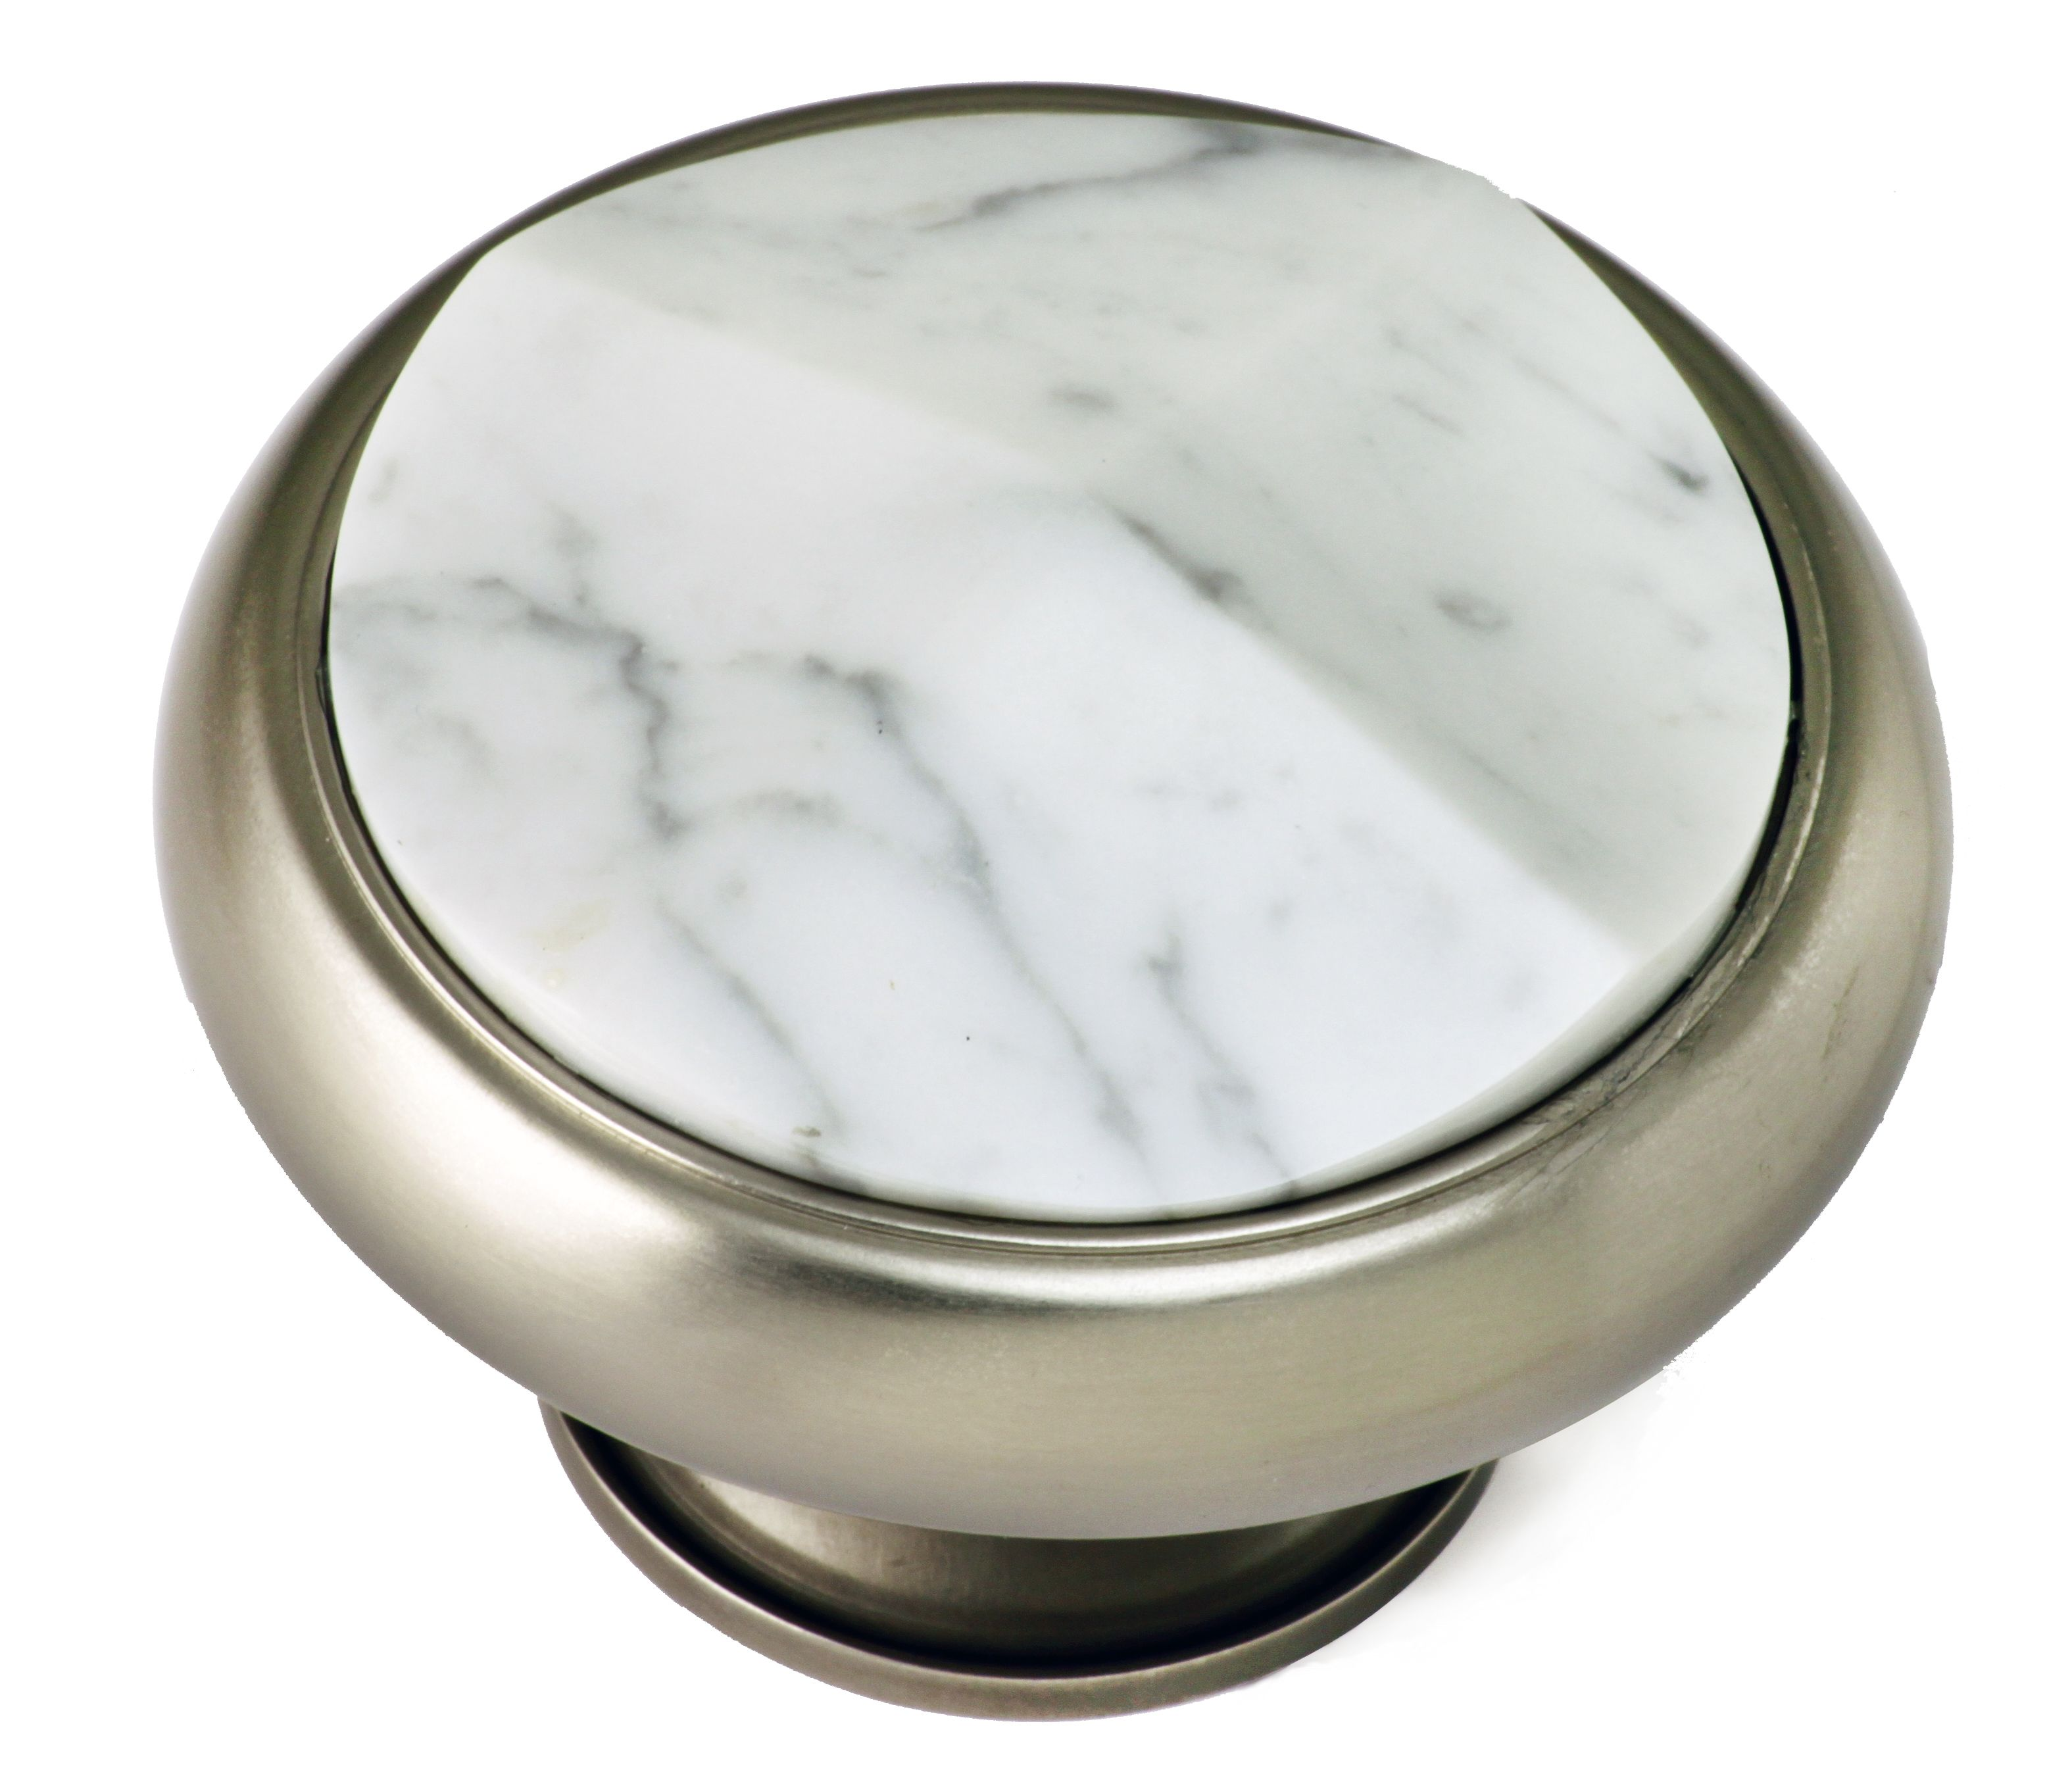 Carrara Marble Set In Satin Nickel Front Door Knob. Fersa Are Bespoke  Hardware Manufacturers Of